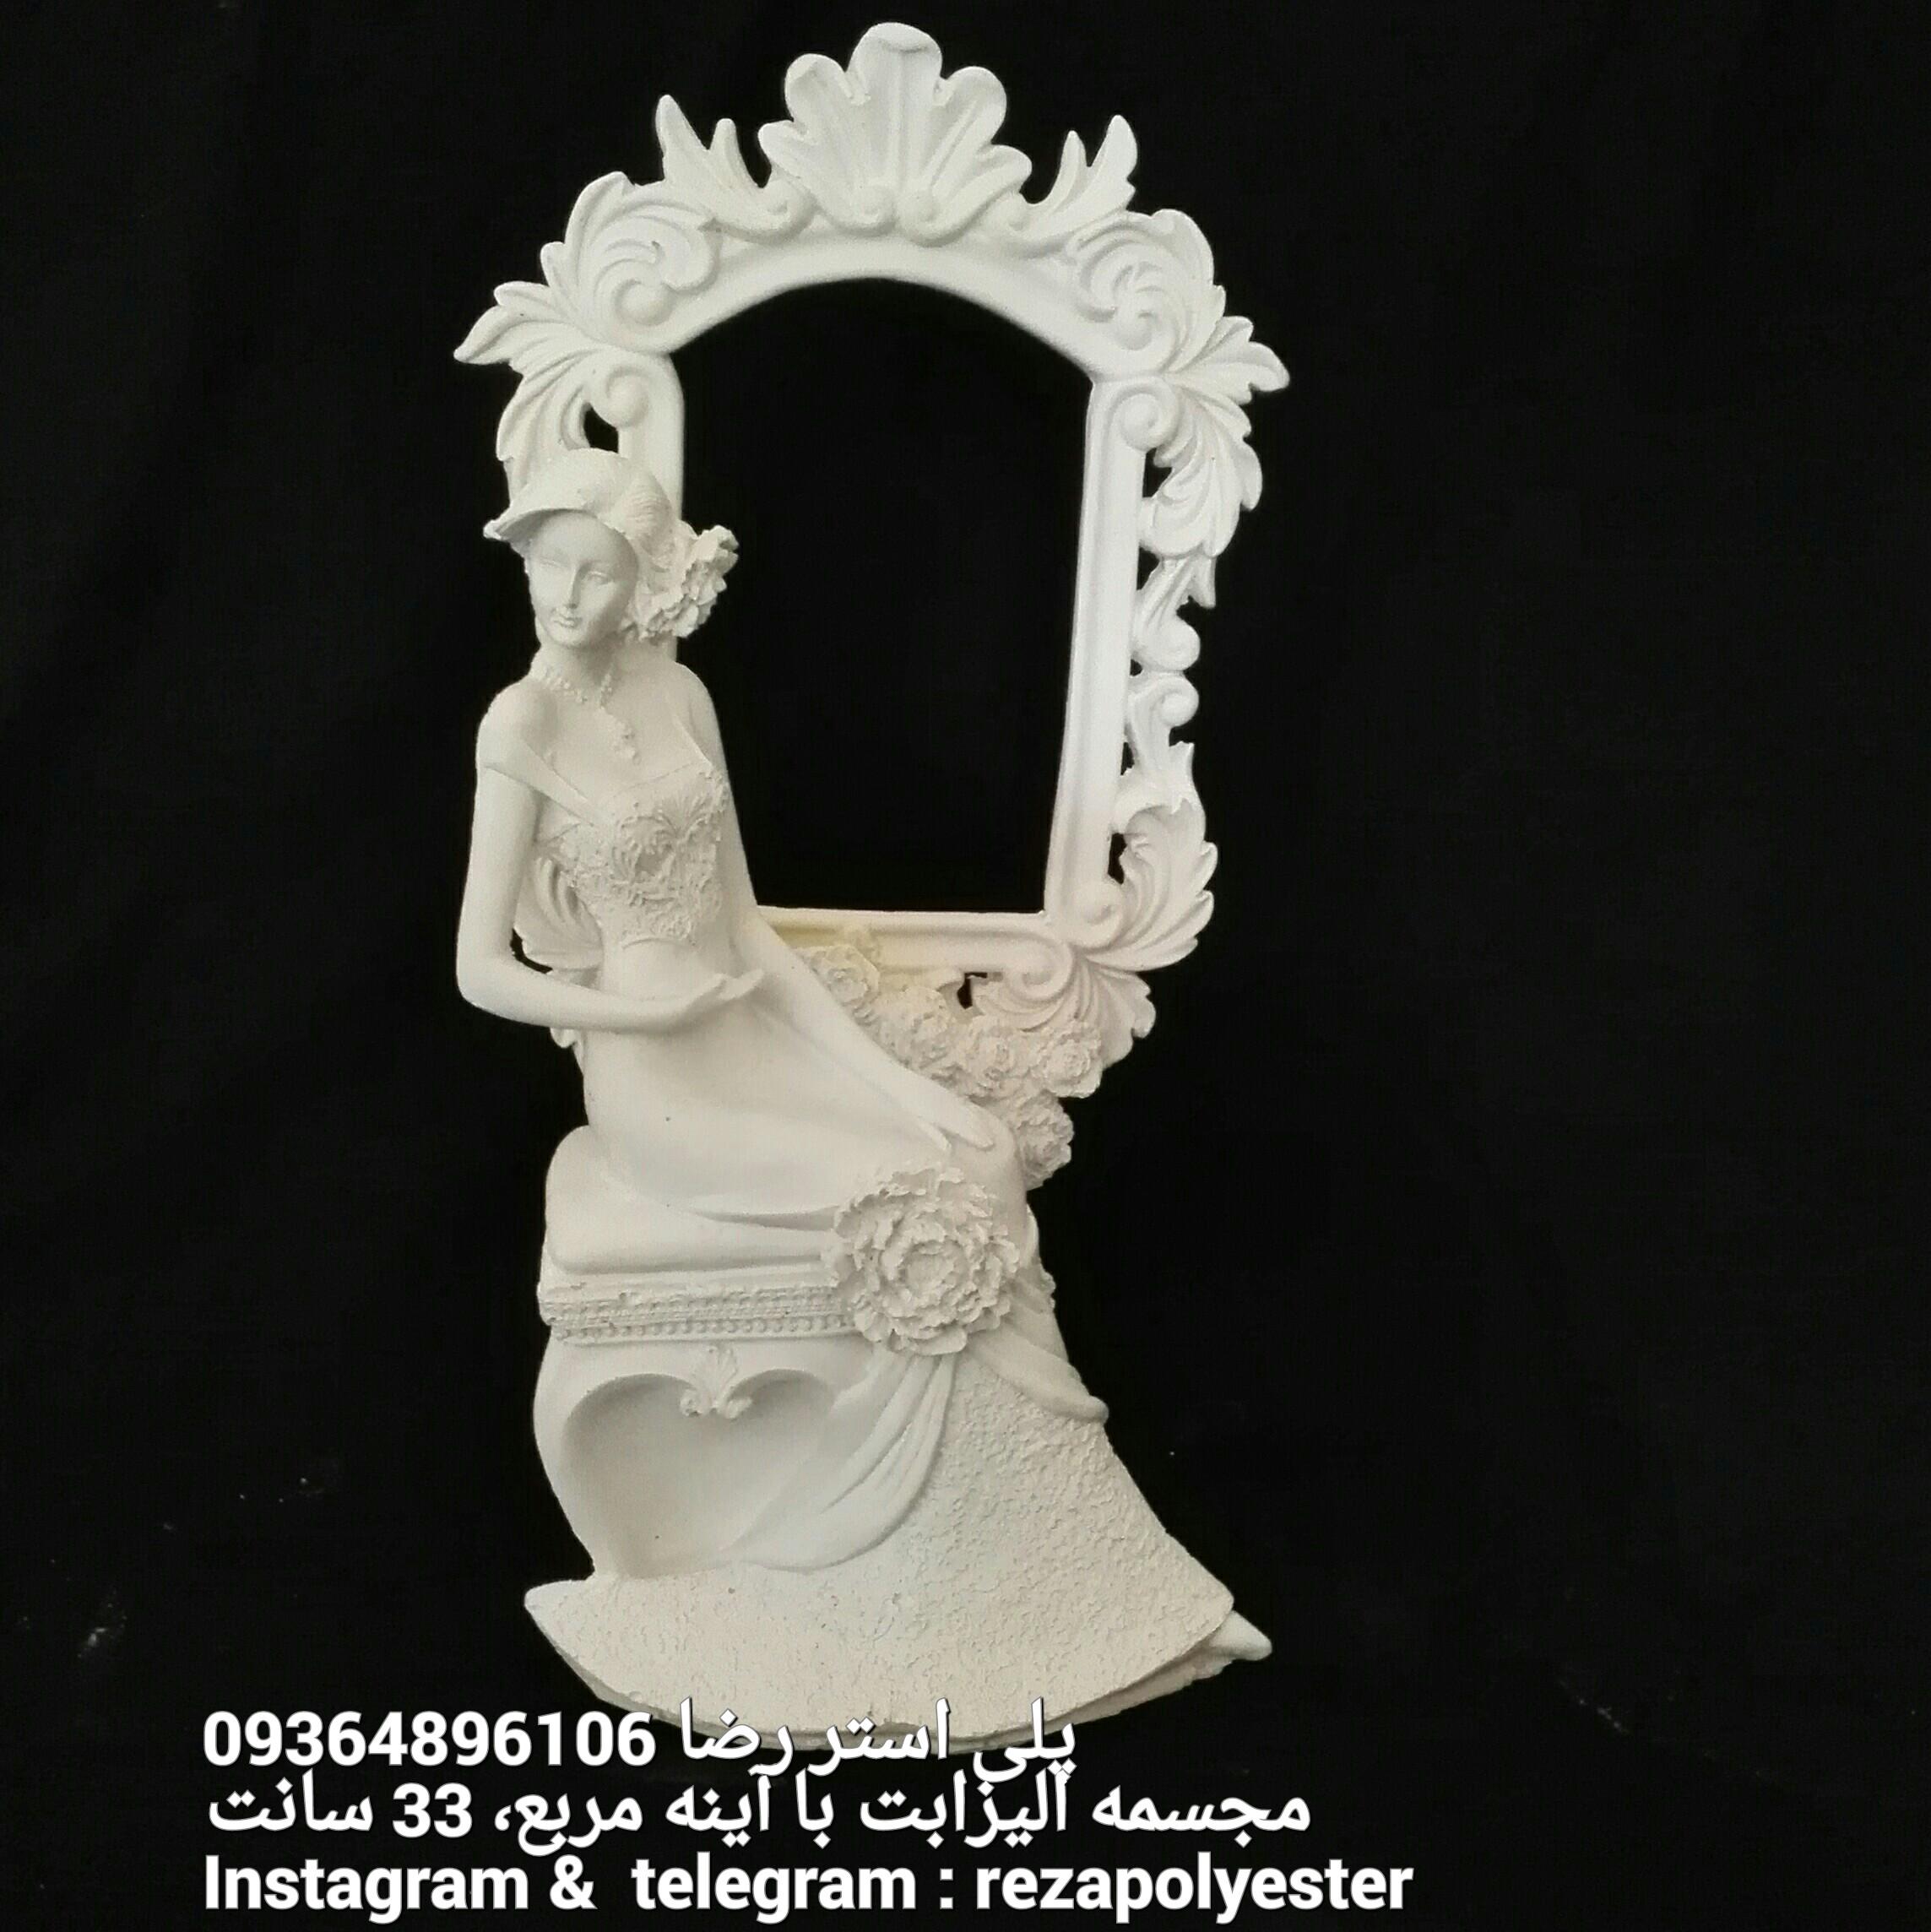 مجسمه الیزابت